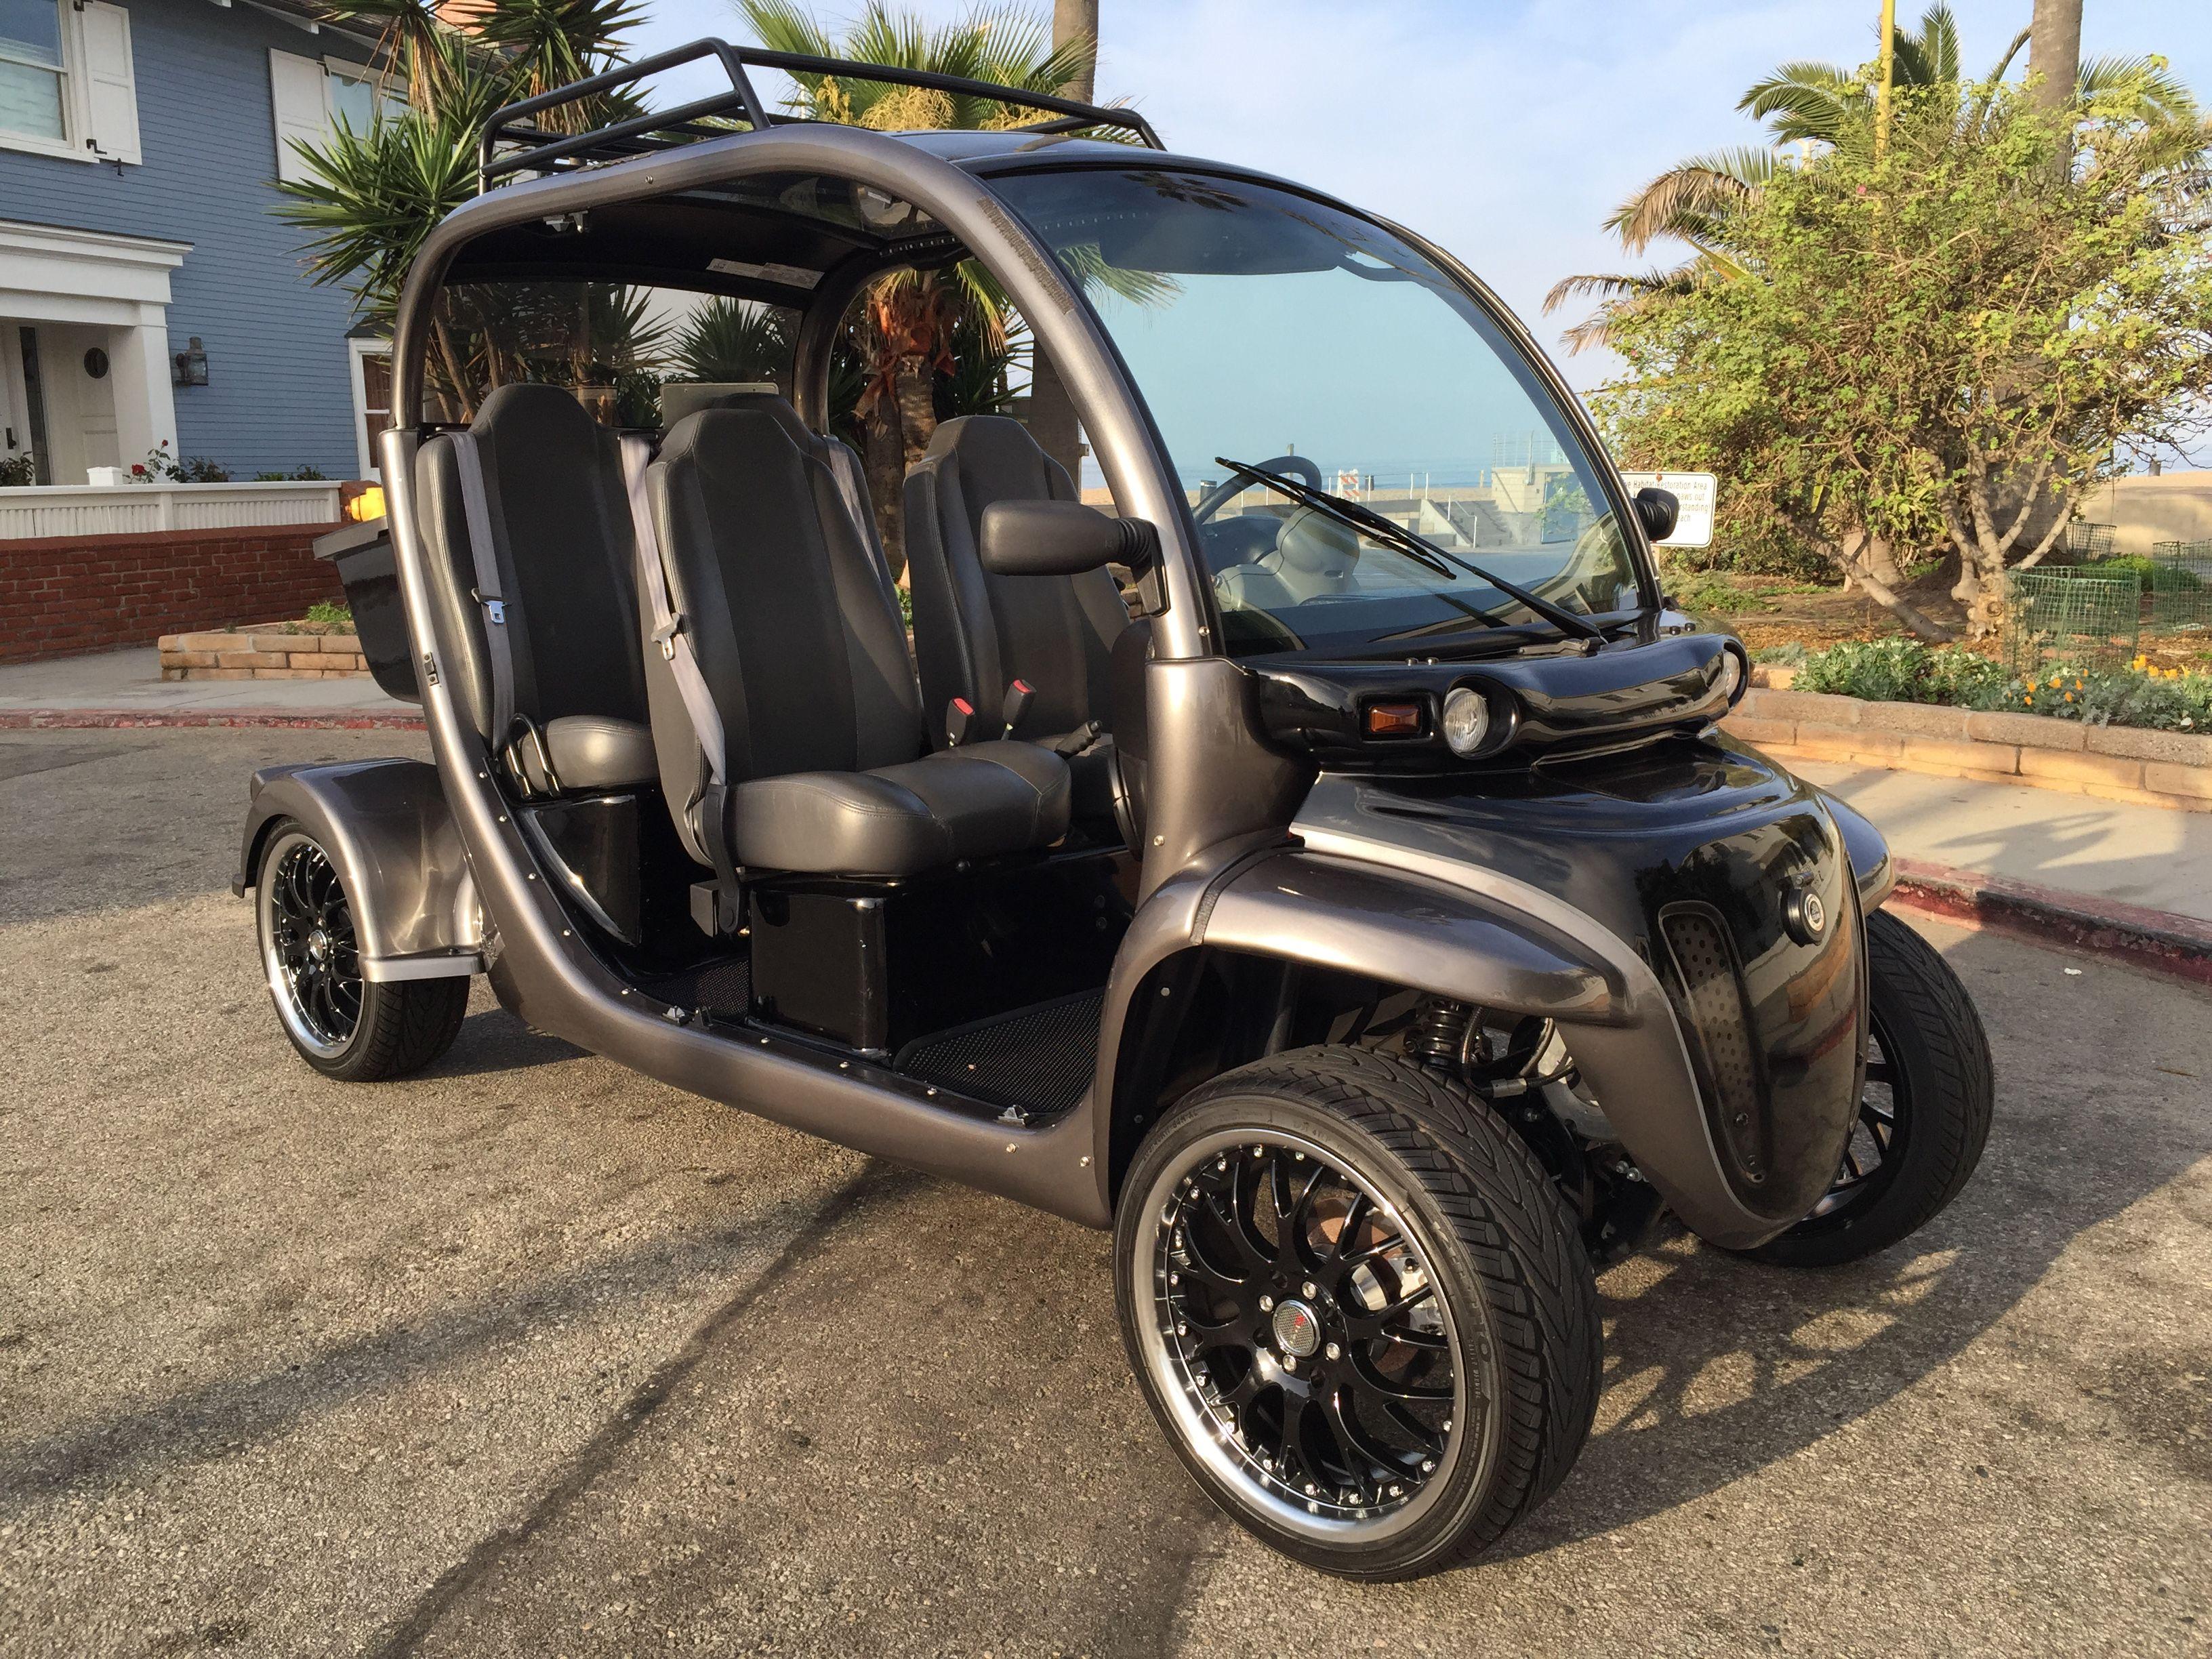 Custom Gem Car By Innovation Motorsports Black And Grey With Wheels